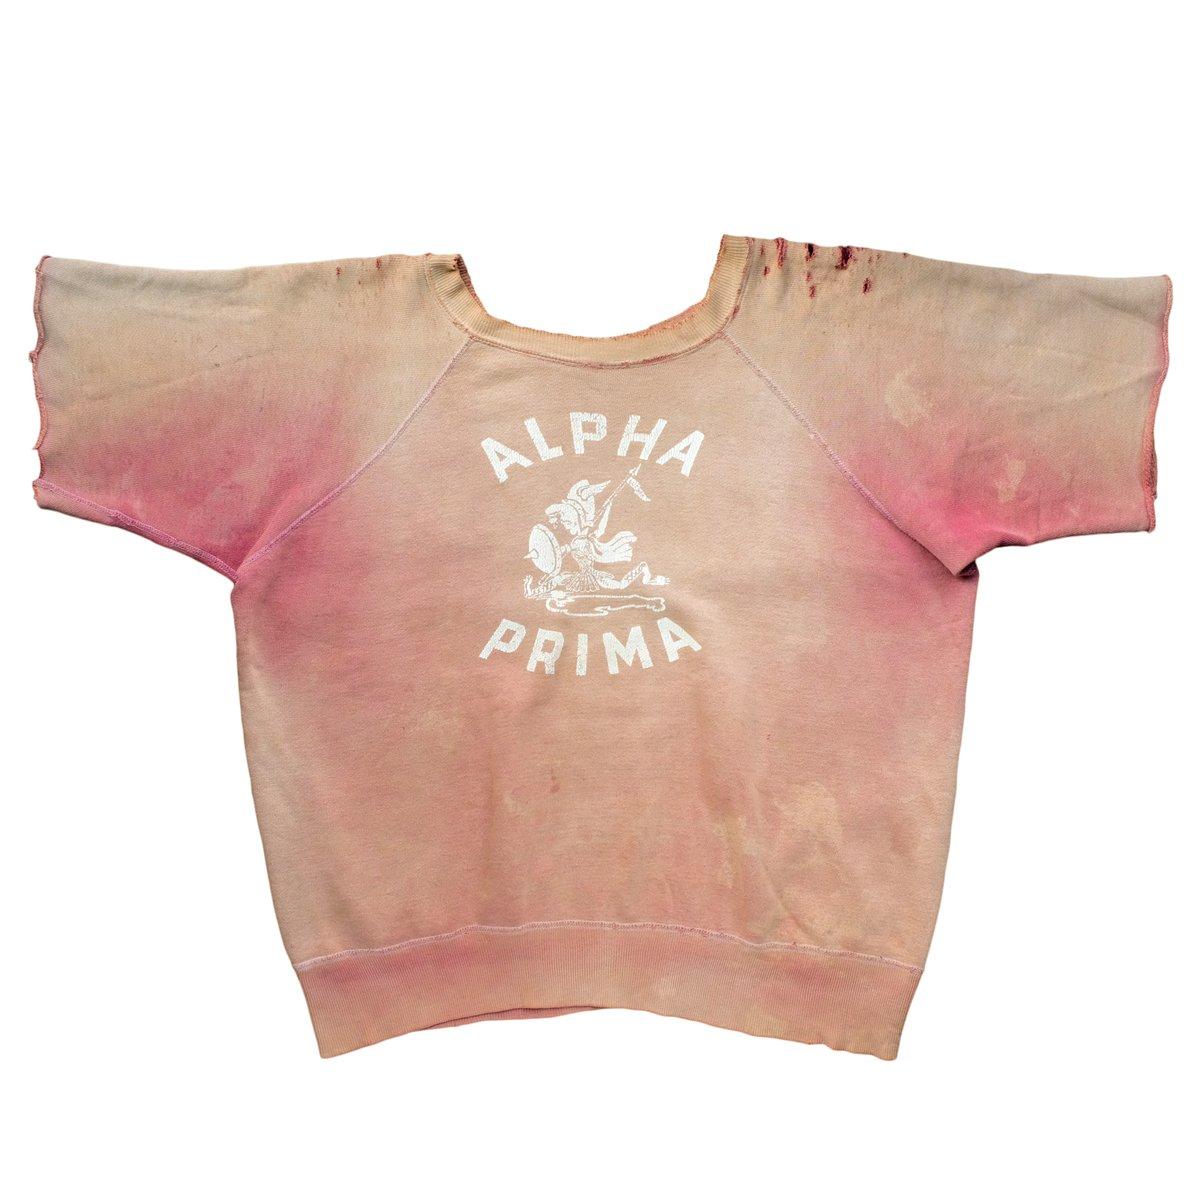 Image of Vintage 50s/60s Sunfaded Alpha Prima Cut Off Sweatshirt